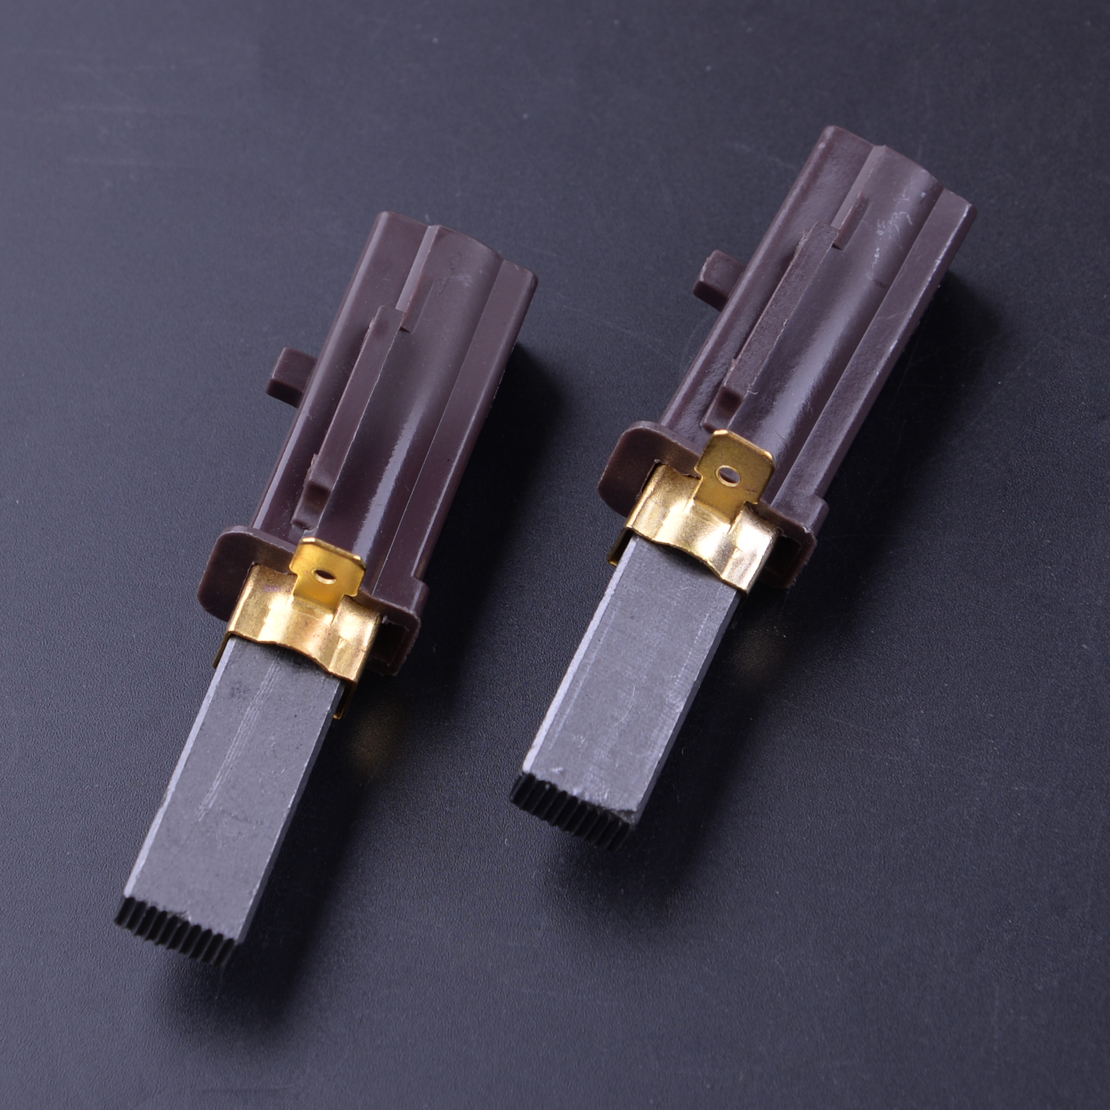 1 Pair Vacuum Cleaner Carbon Brushes For Numatic Henry Hetty  NRV200 HVR200-22